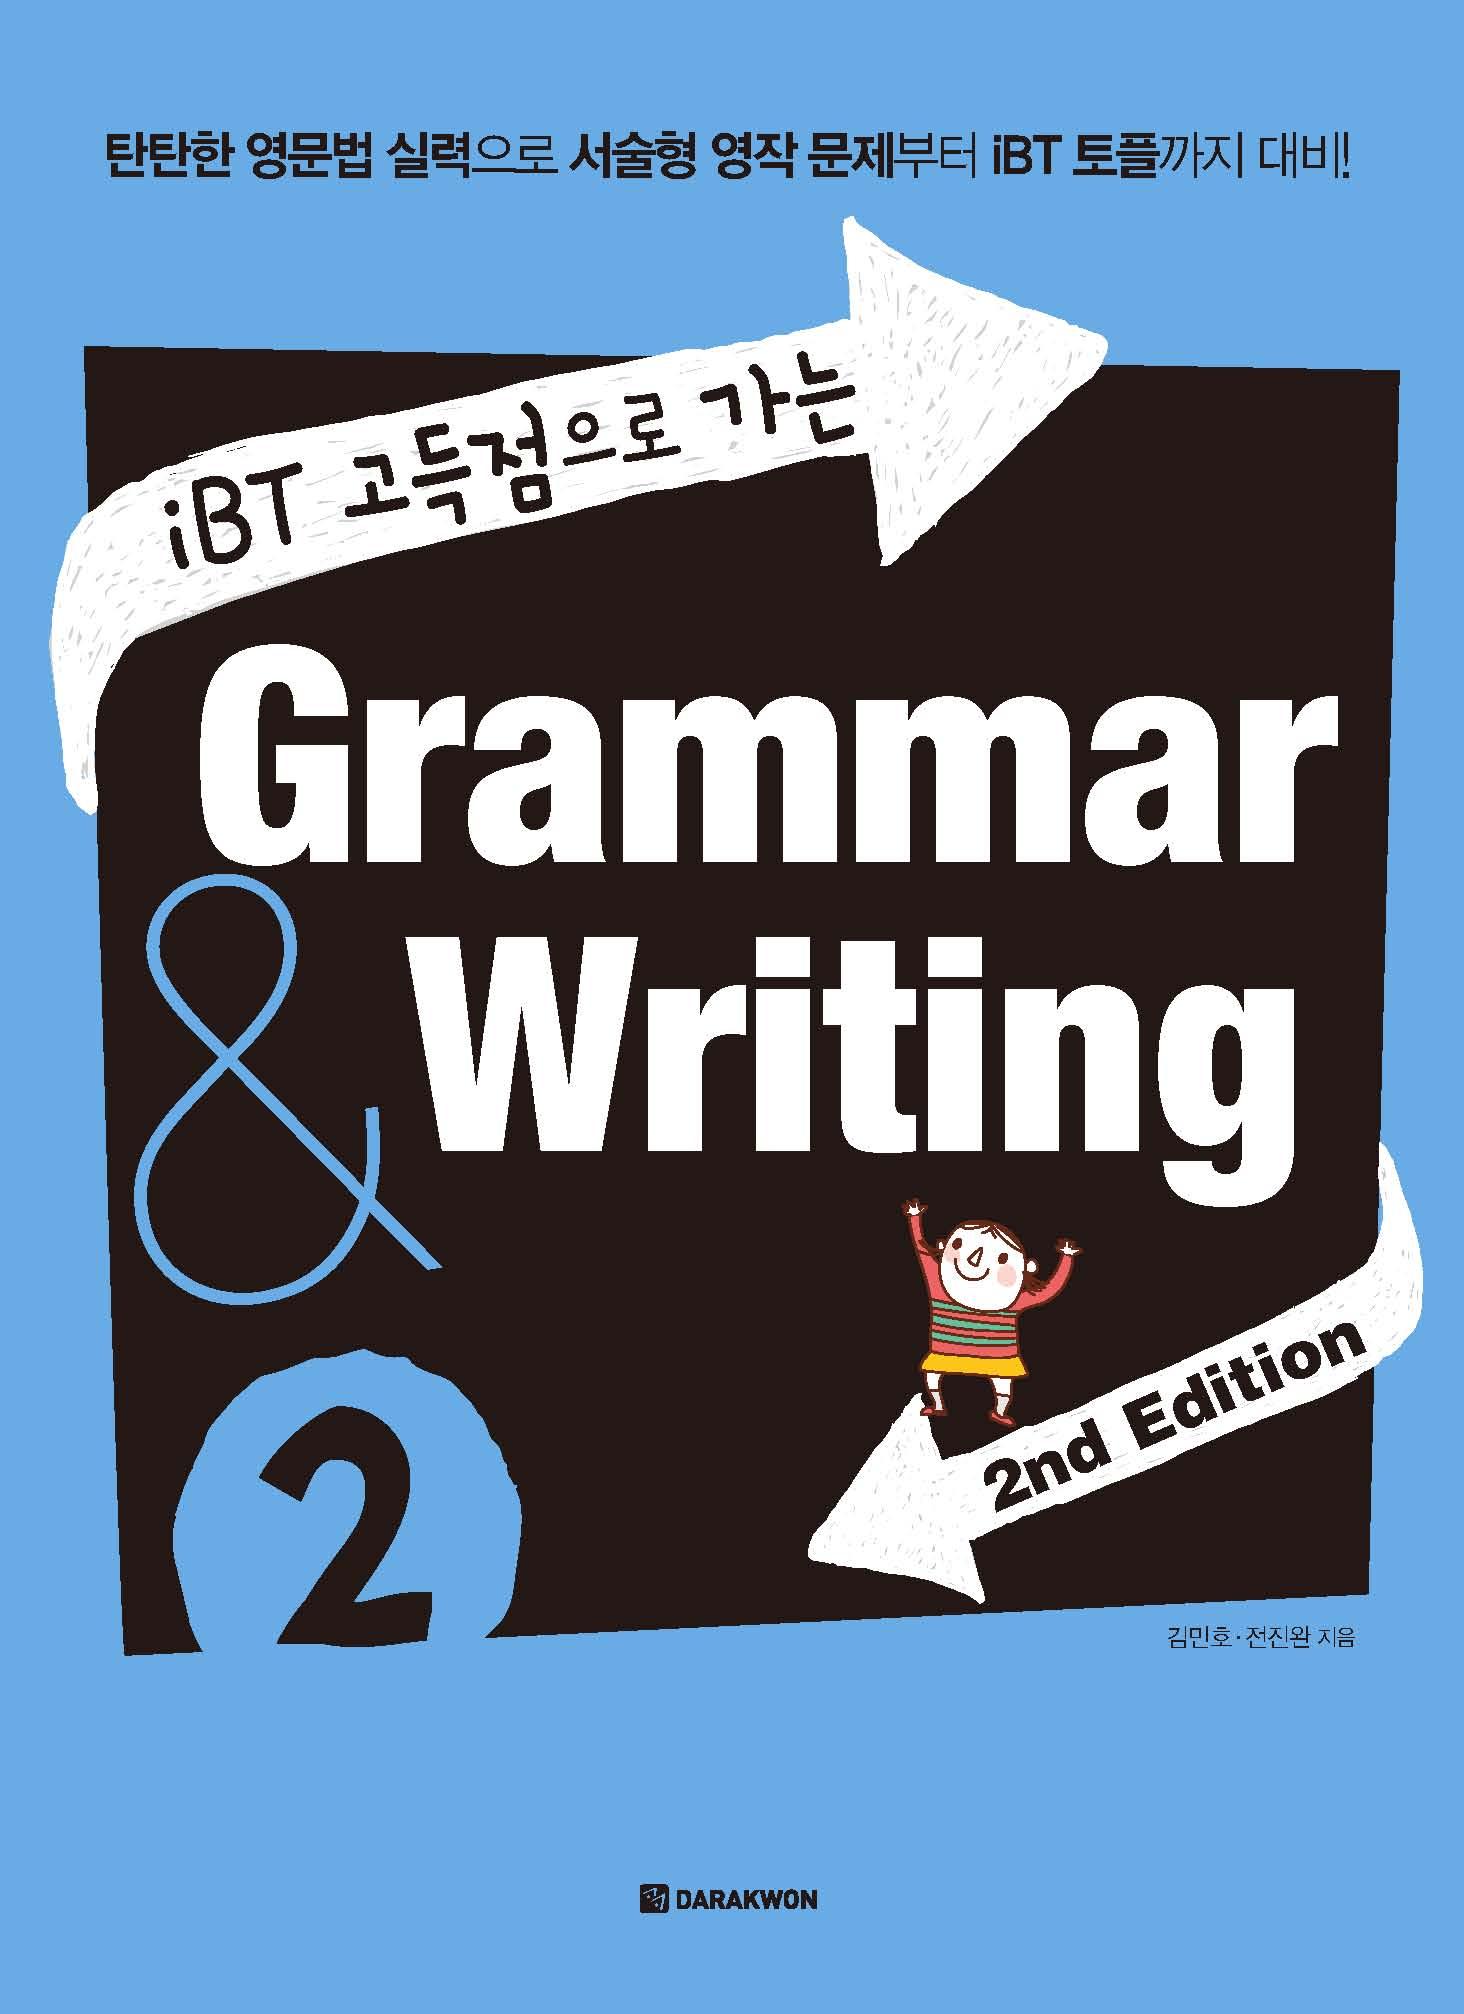 [iBT 고득점으로 가는 Grammar&Writing] (2nd Edition) iBT 고득점으로 가는 Grammar&Writing 2